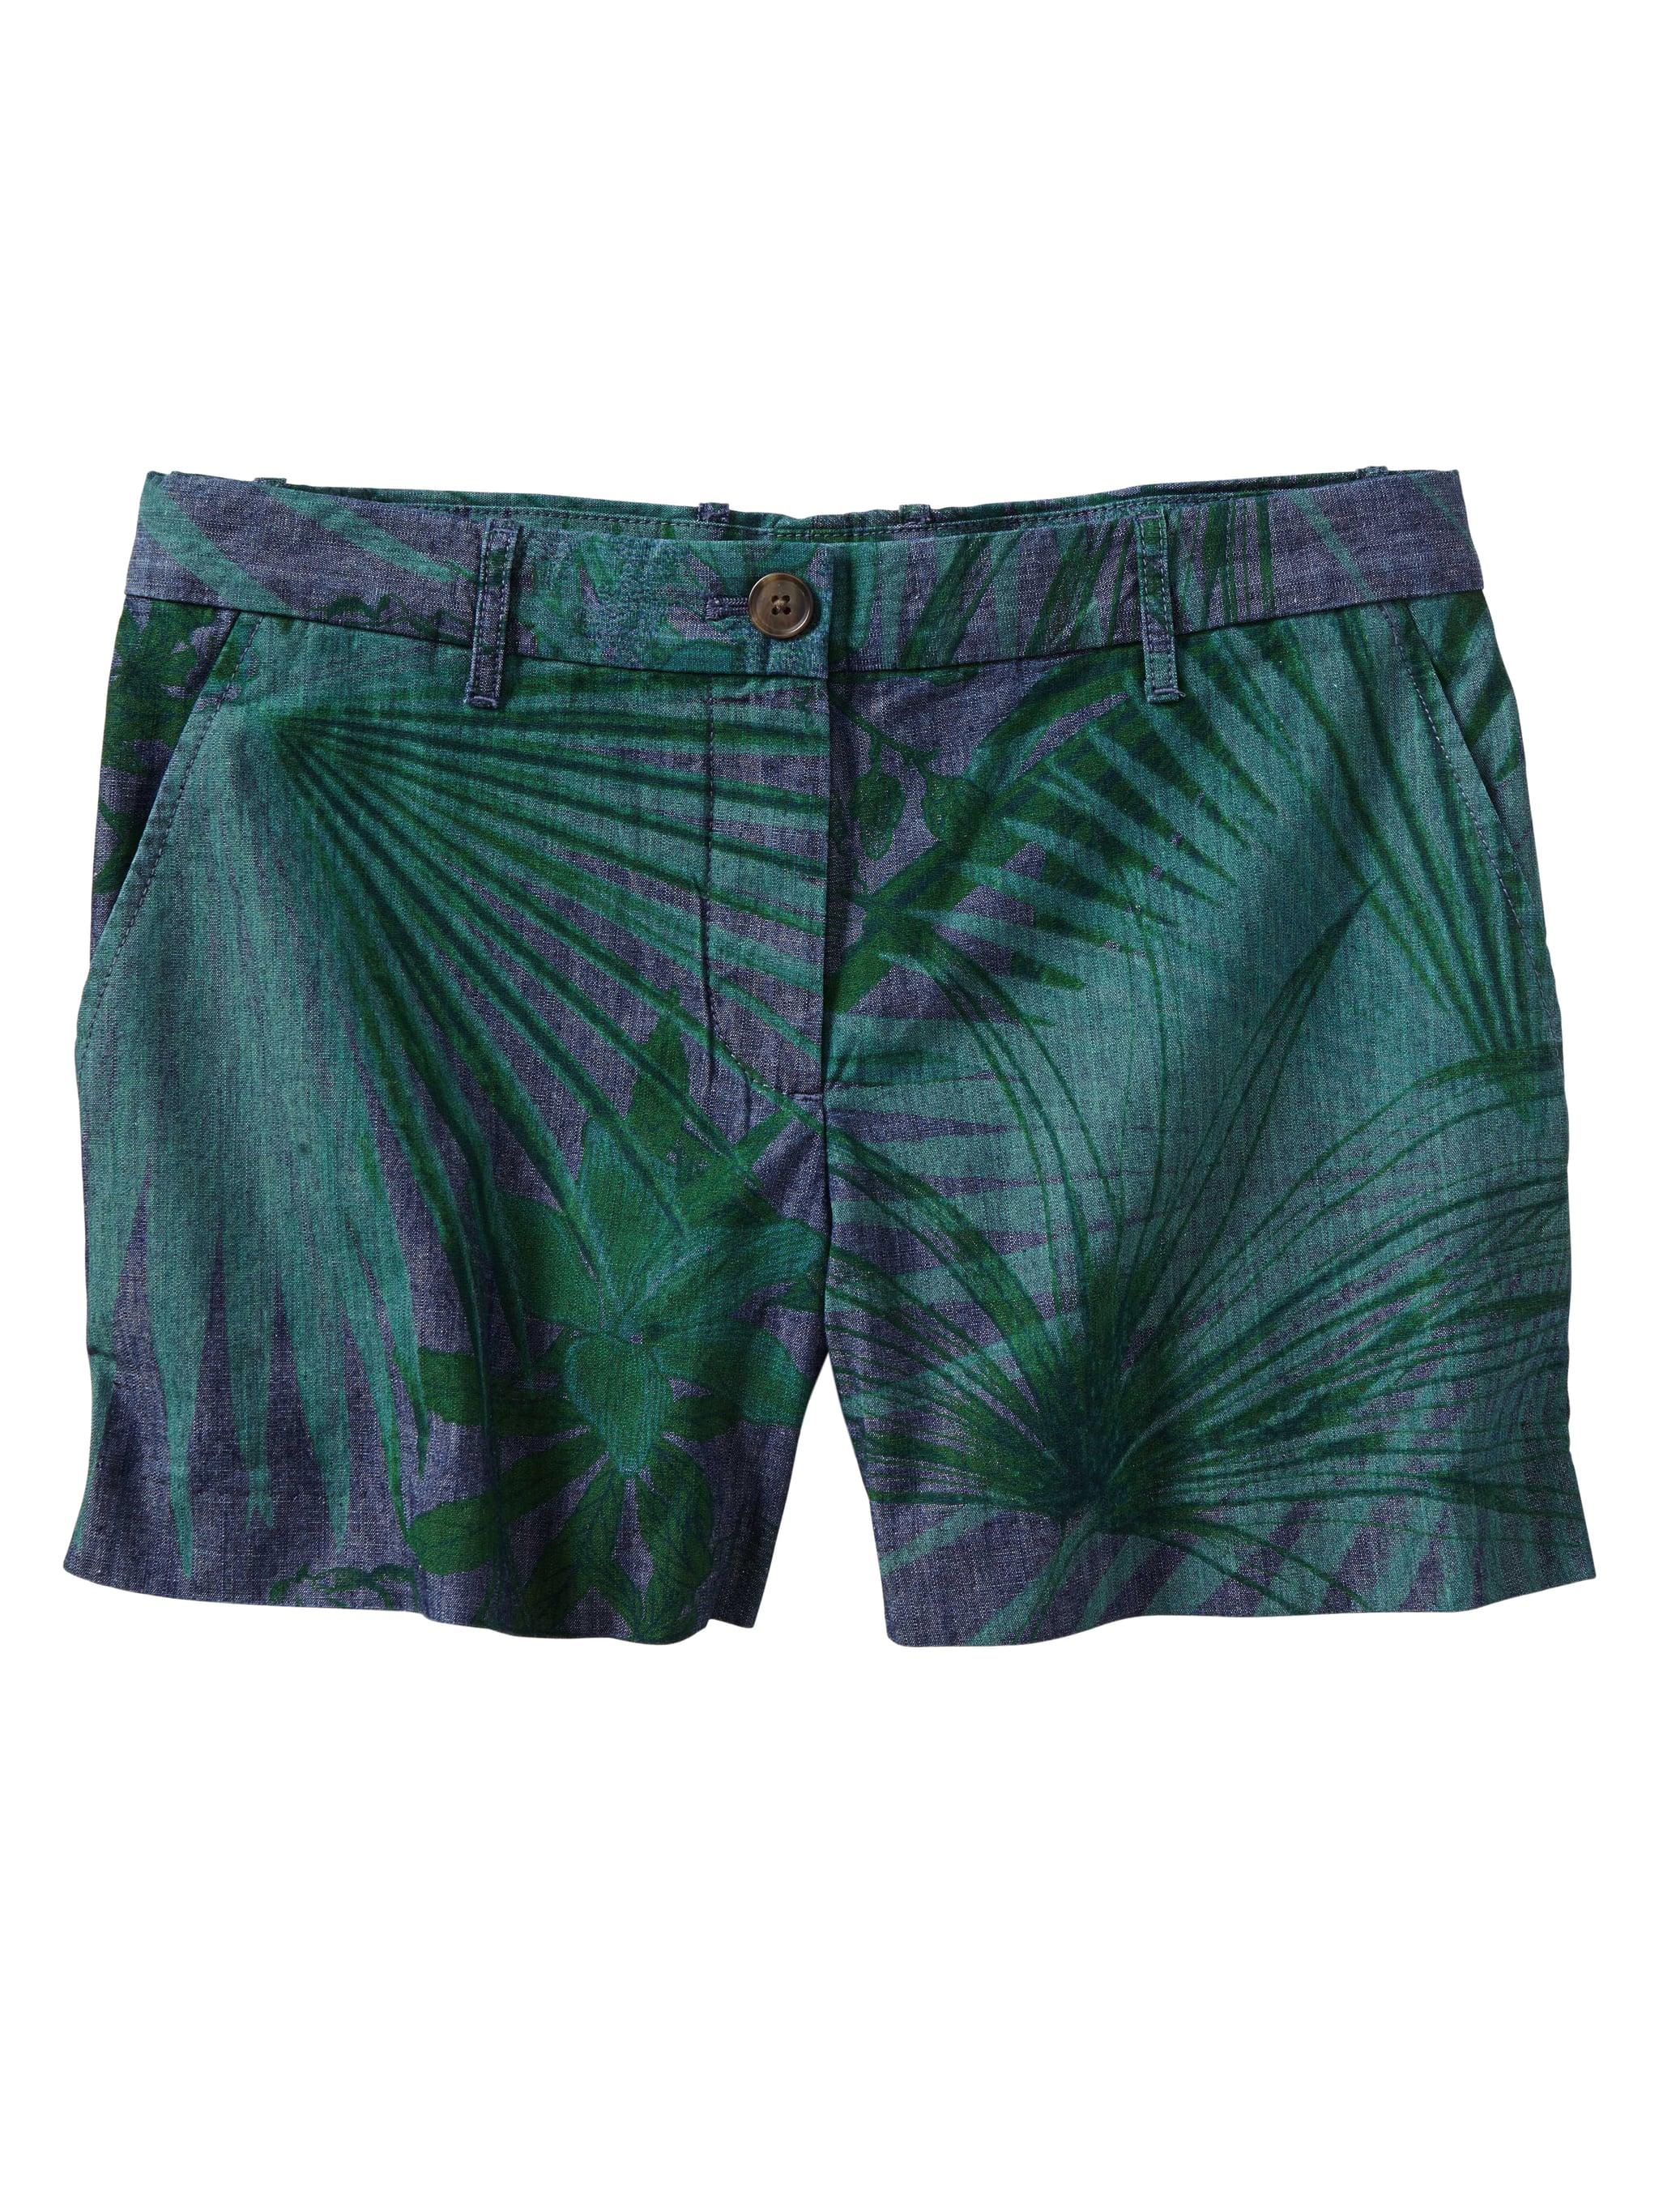 Gap Sunkissed Palm Print Chambray Shorts